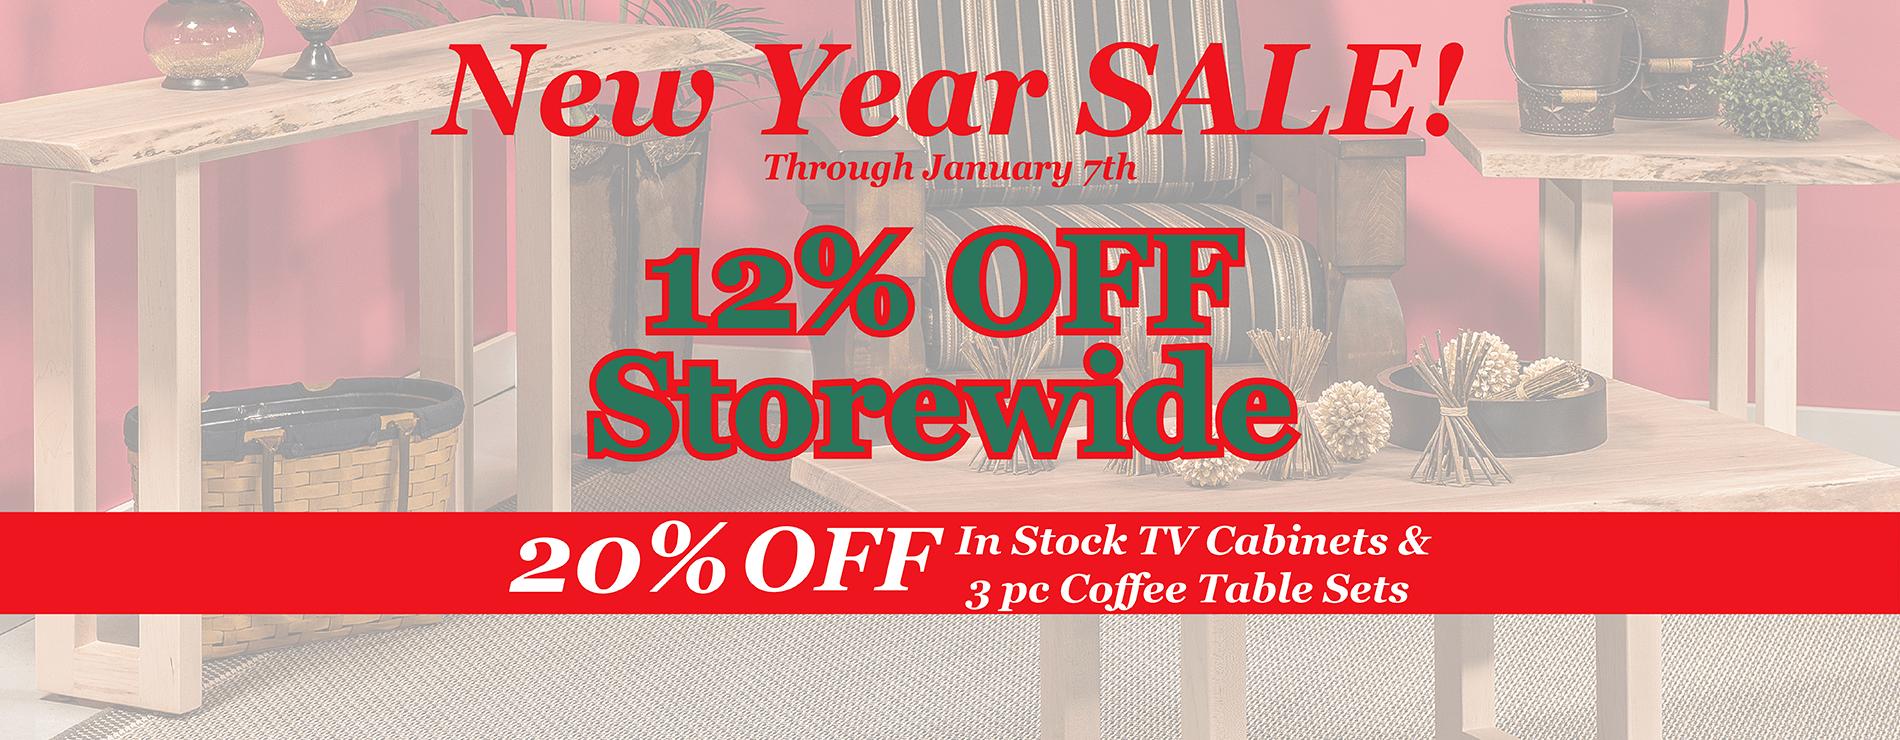 Amish furniture website new year sale brandenberry 2019